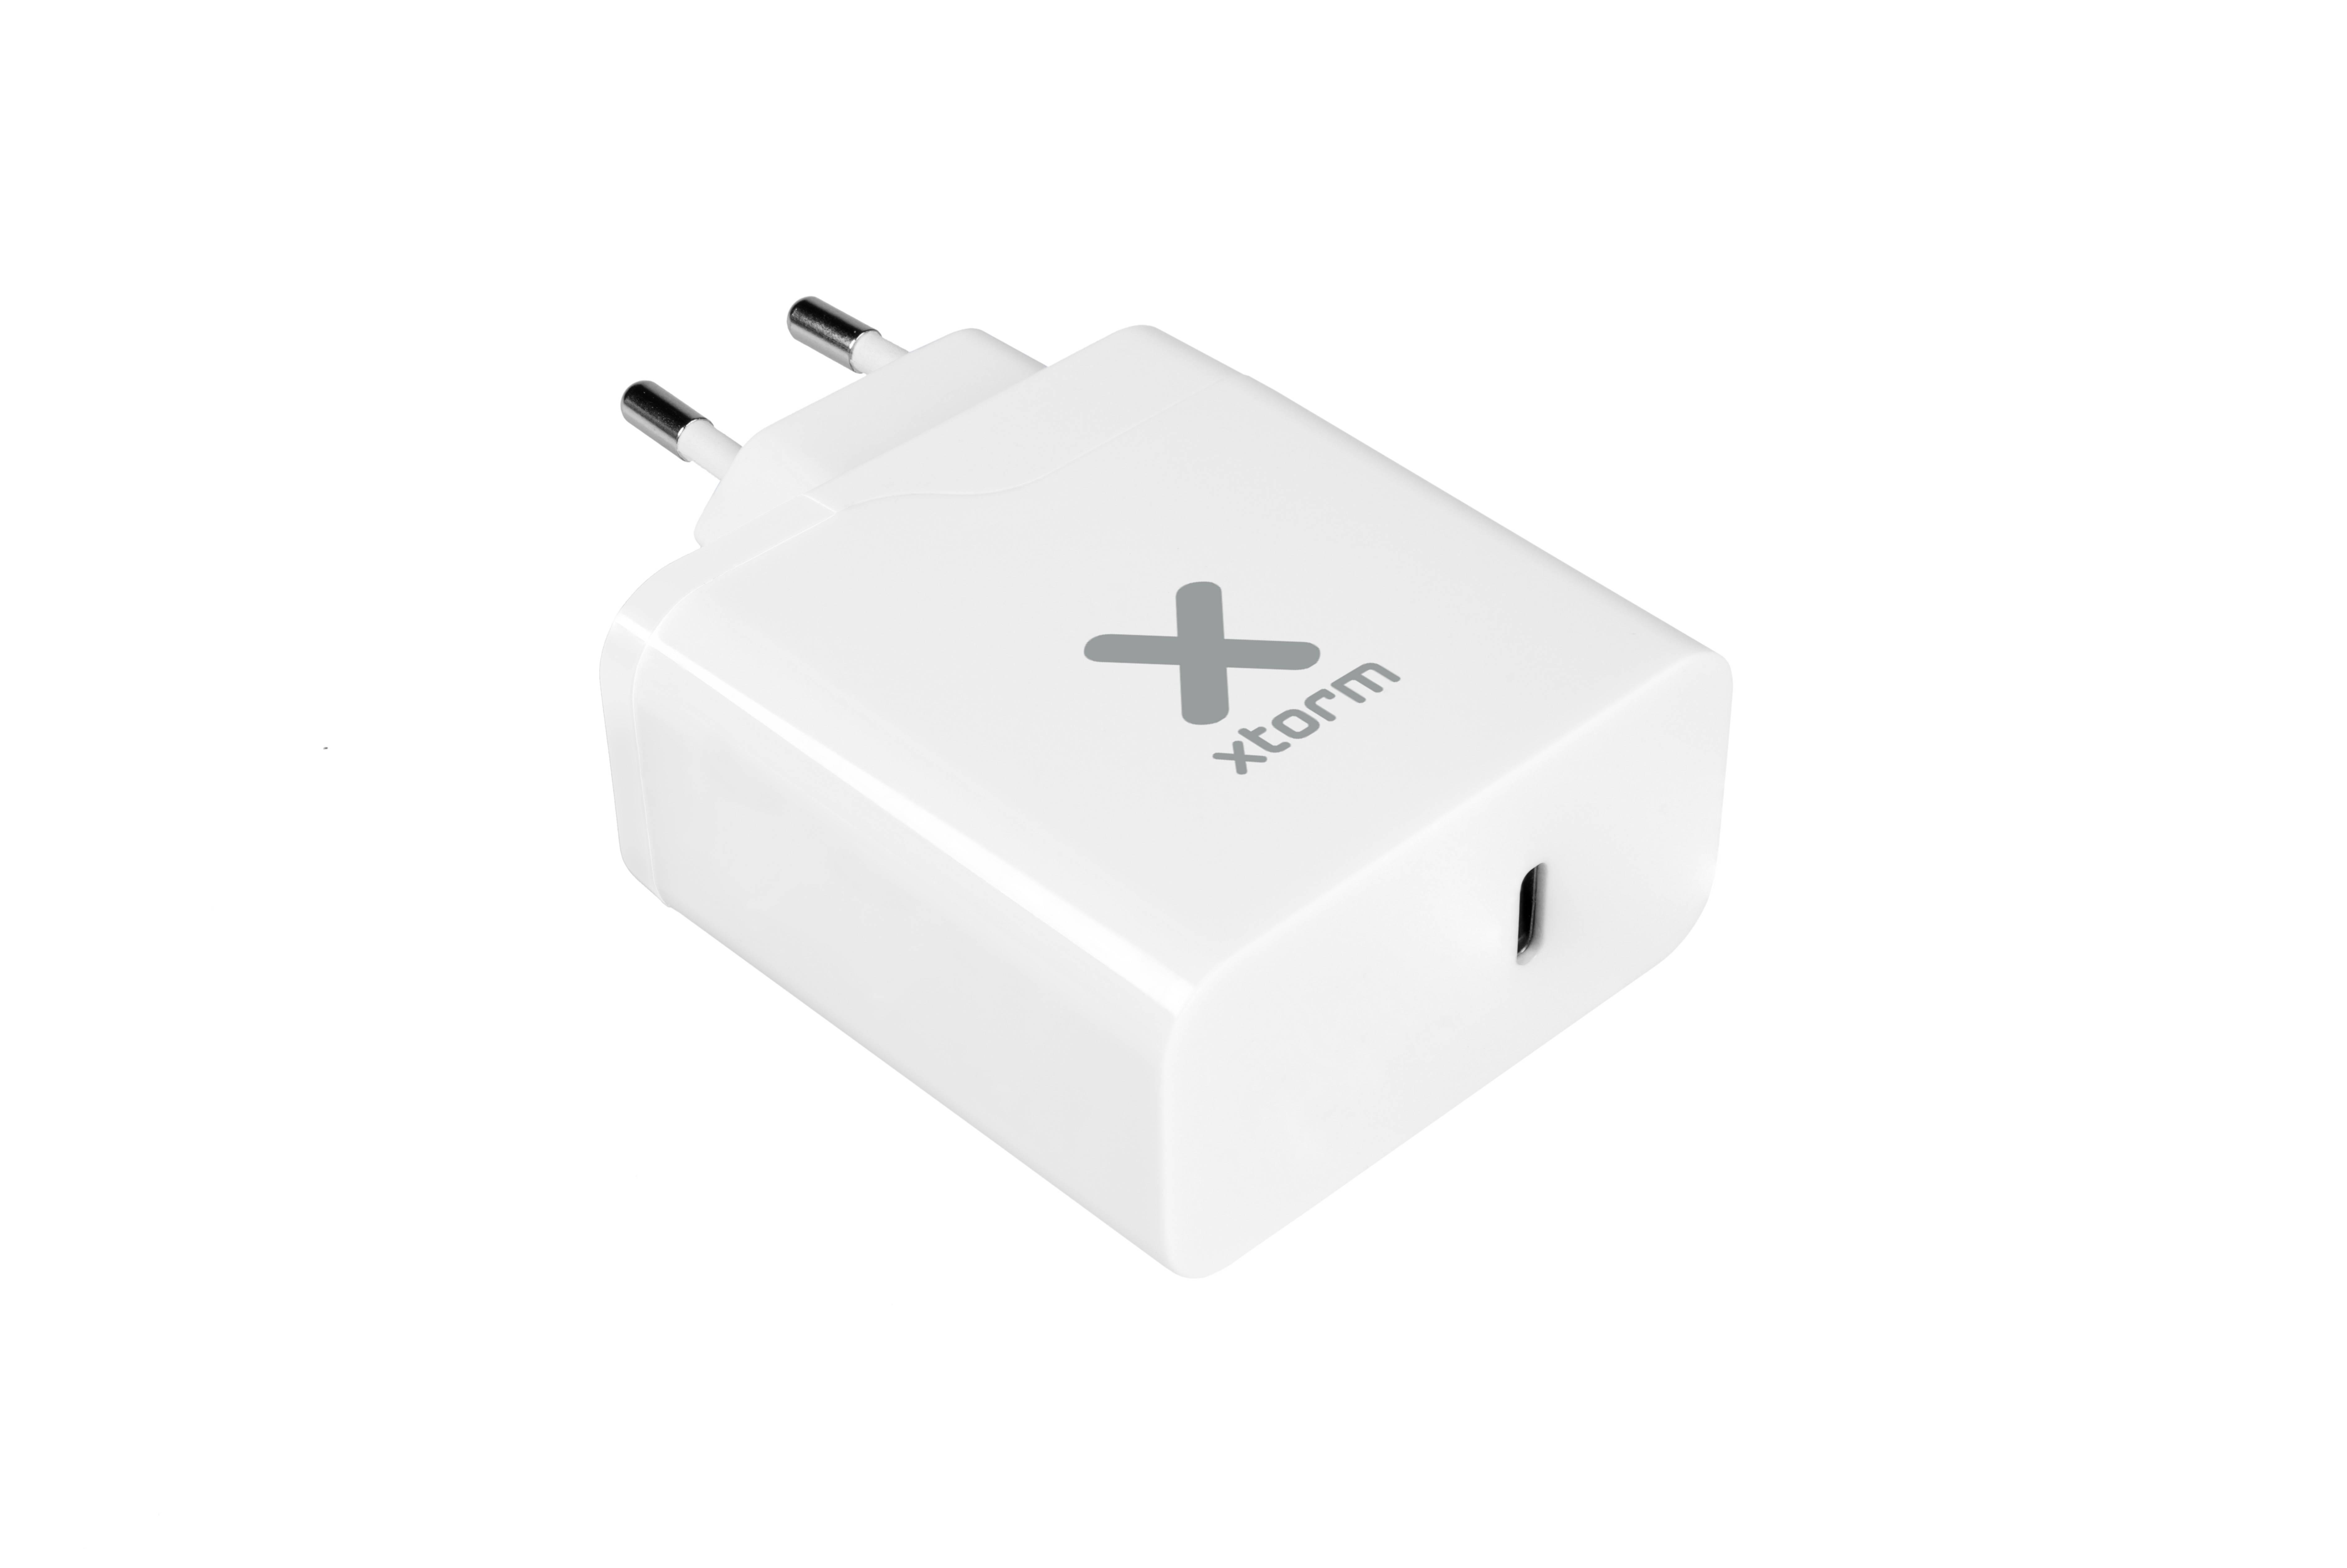 Sít'ový adaptér - Xtorm, PD 29W USB-C